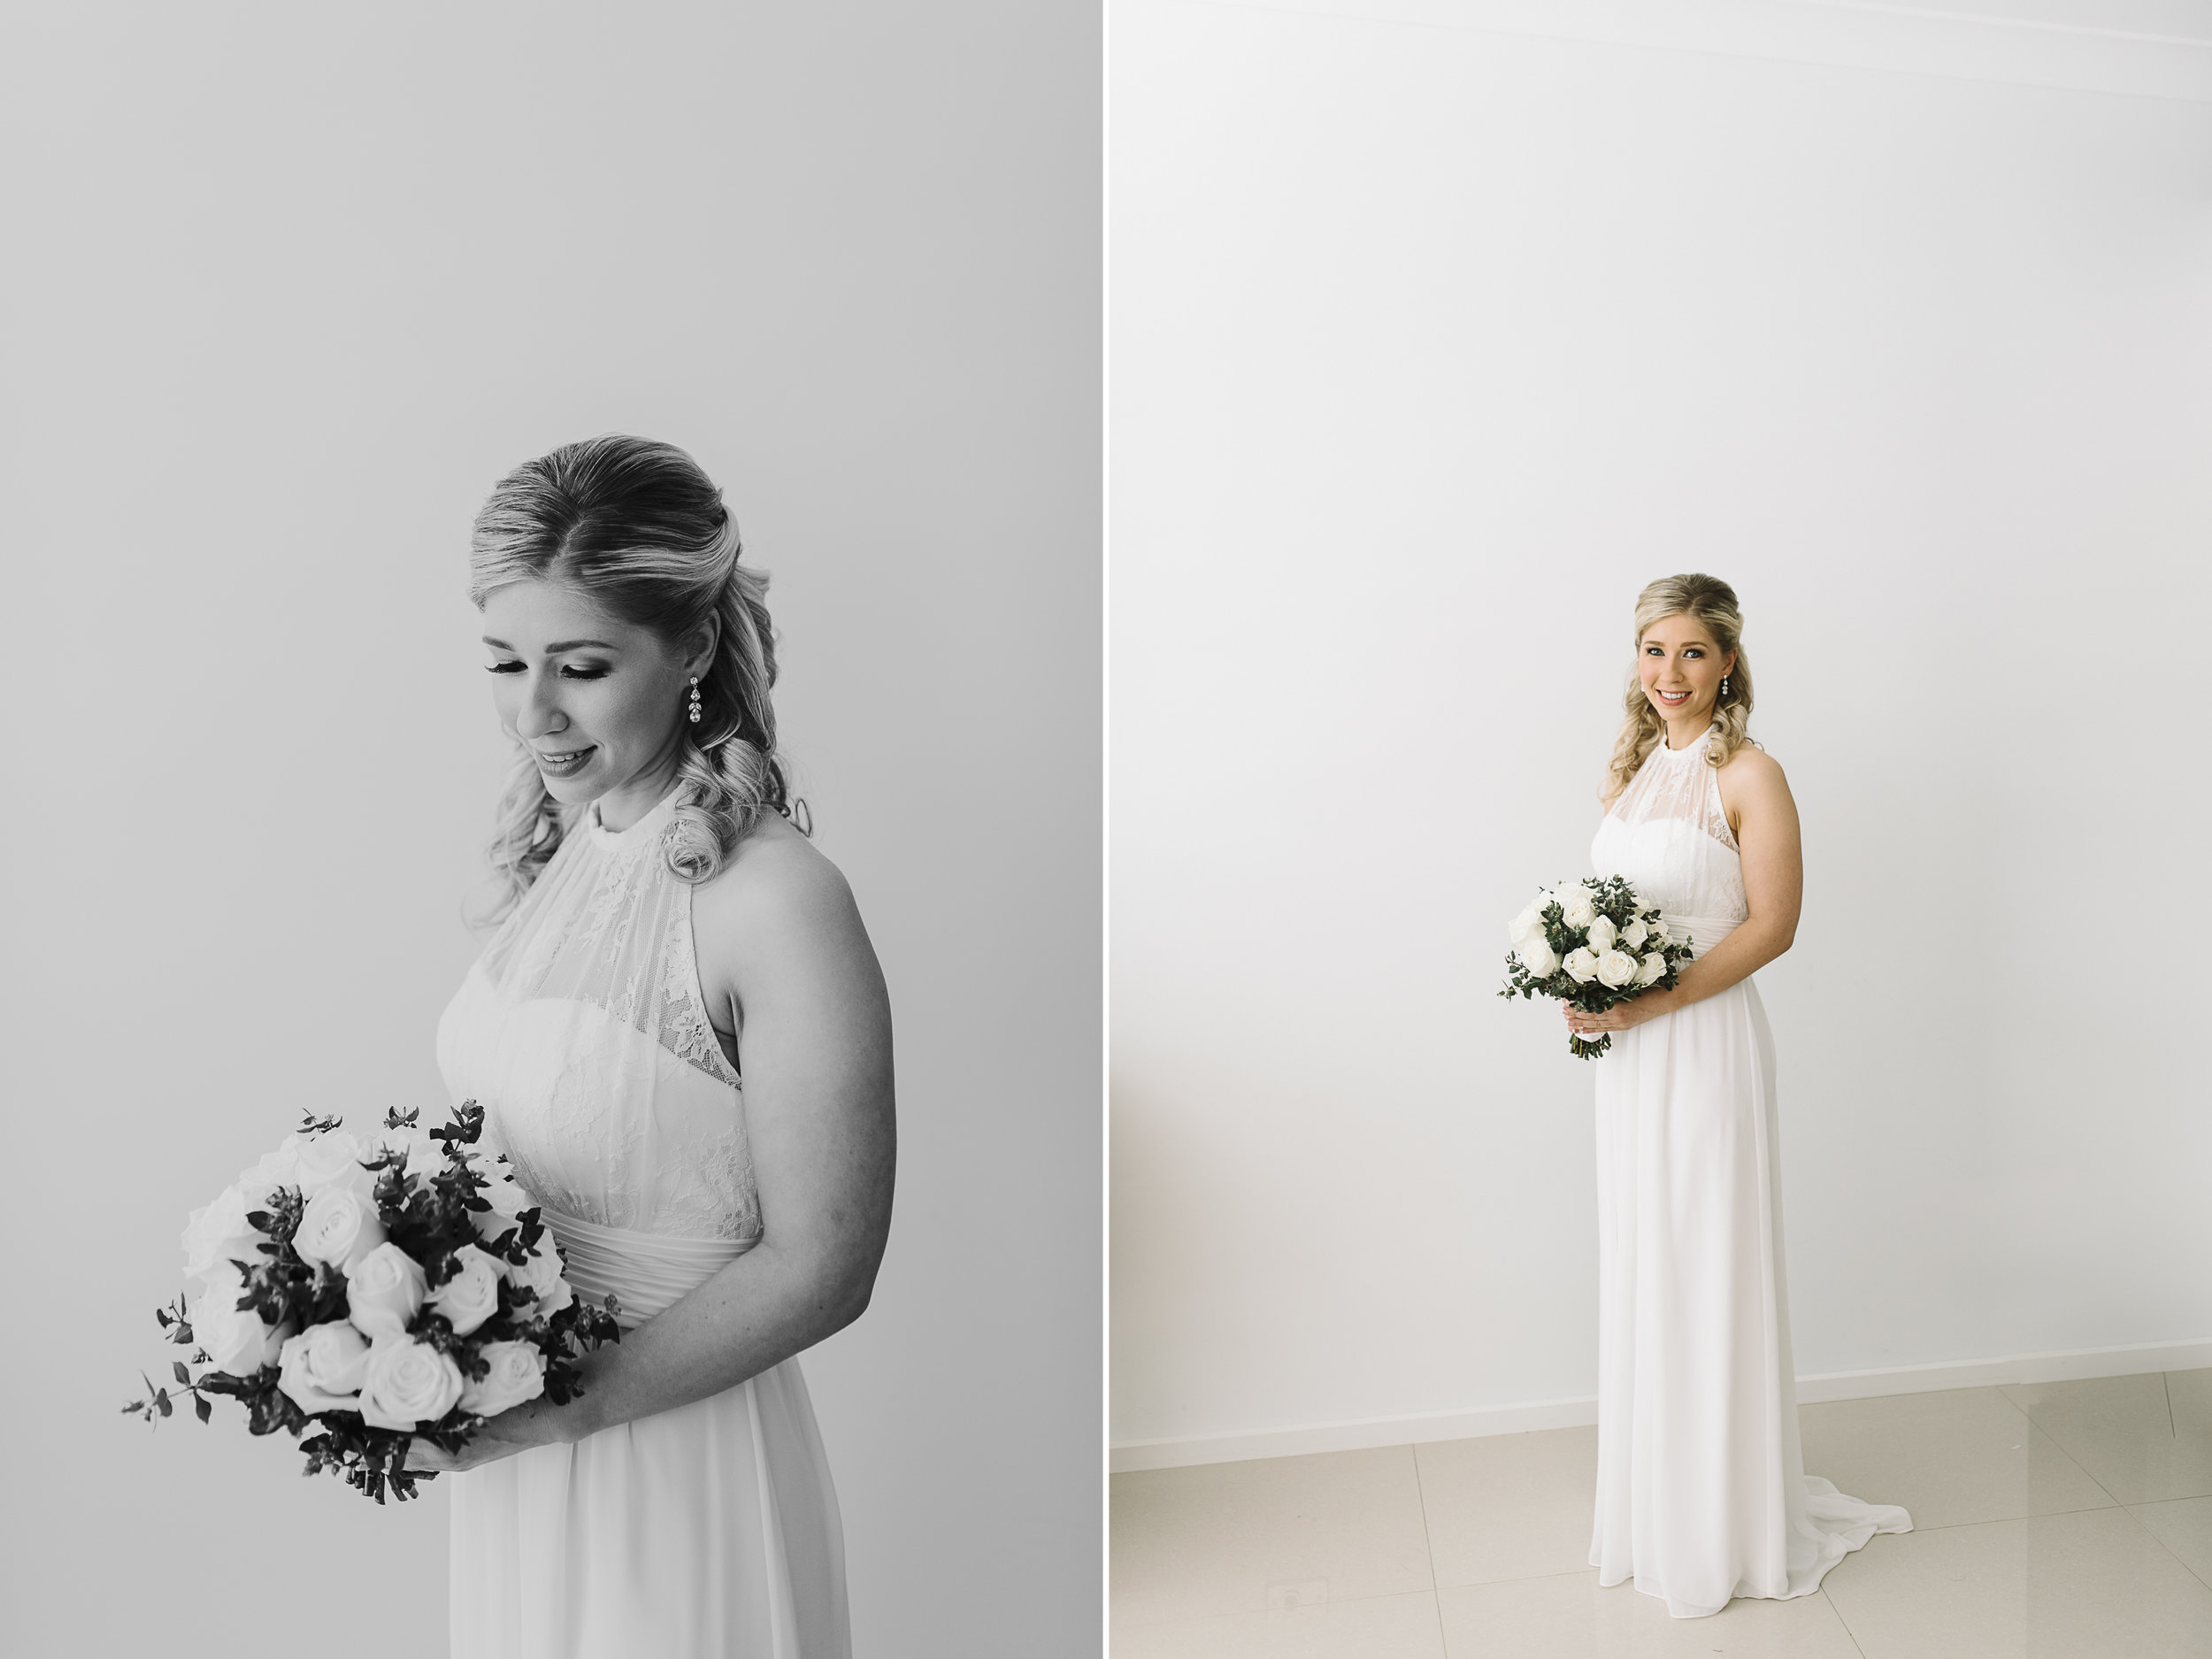 sydney-wedding-photography-bride-1.jpg